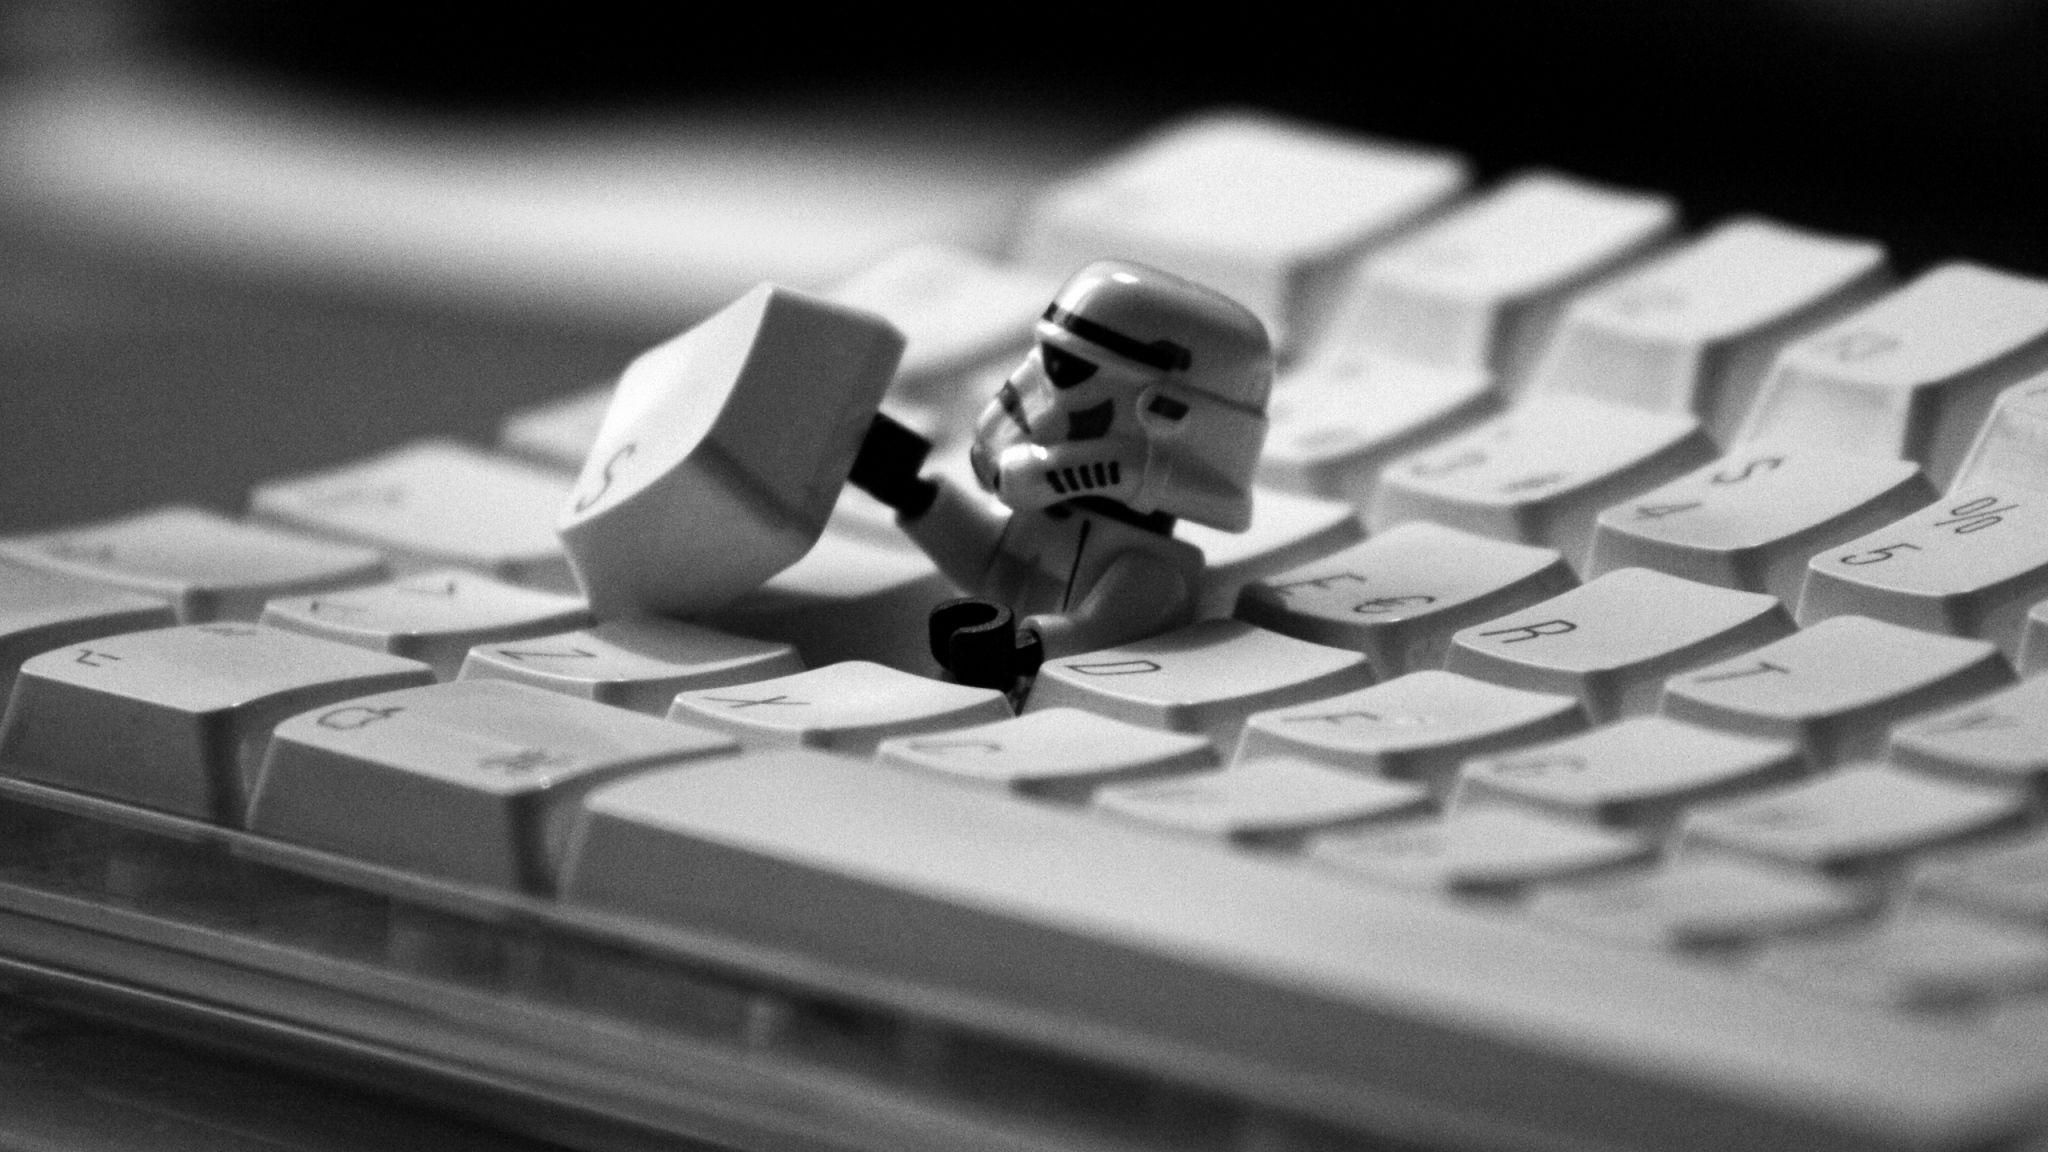 2048x1152 Wallpaper Keyboard Robot Bw Clone Lego Papel De Parede Star Wars Papeis De Parede Papel De Parede Computador